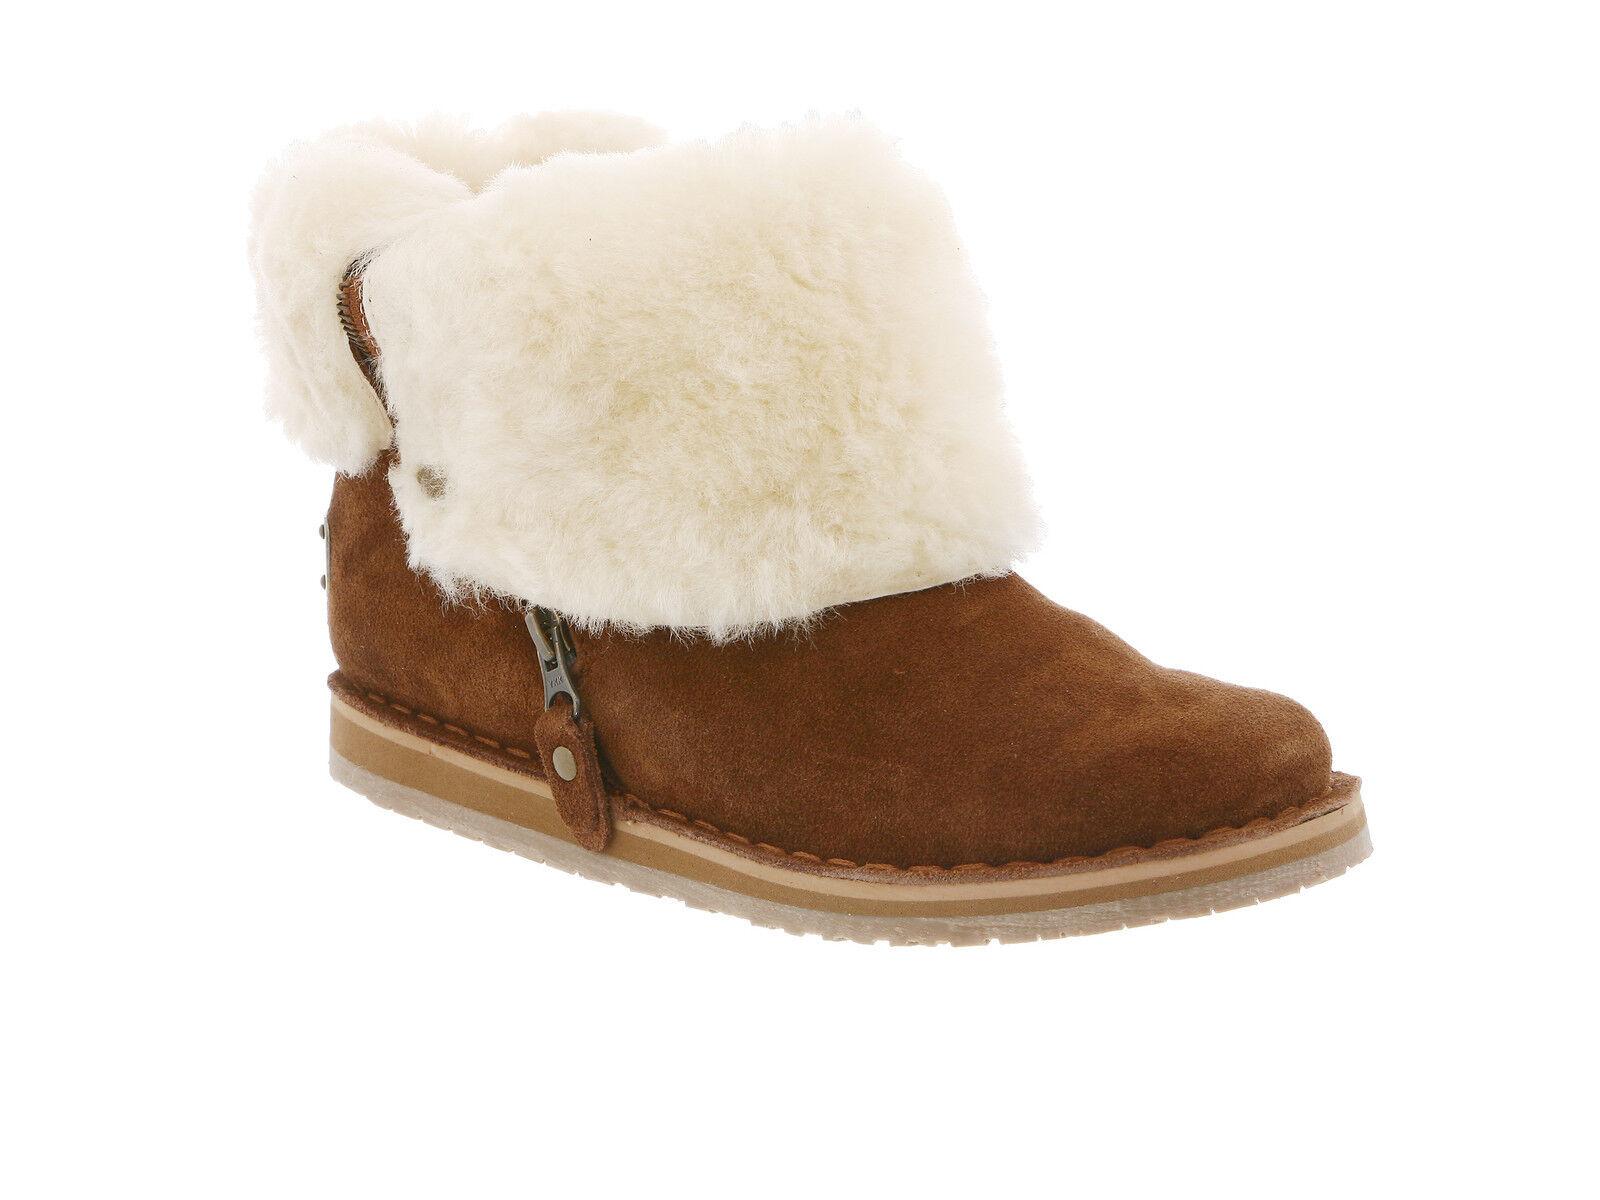 Rj's Fuzzies Genuine Sheepskin Trixie Stiefel Chestnut Größes Medium (M, B)